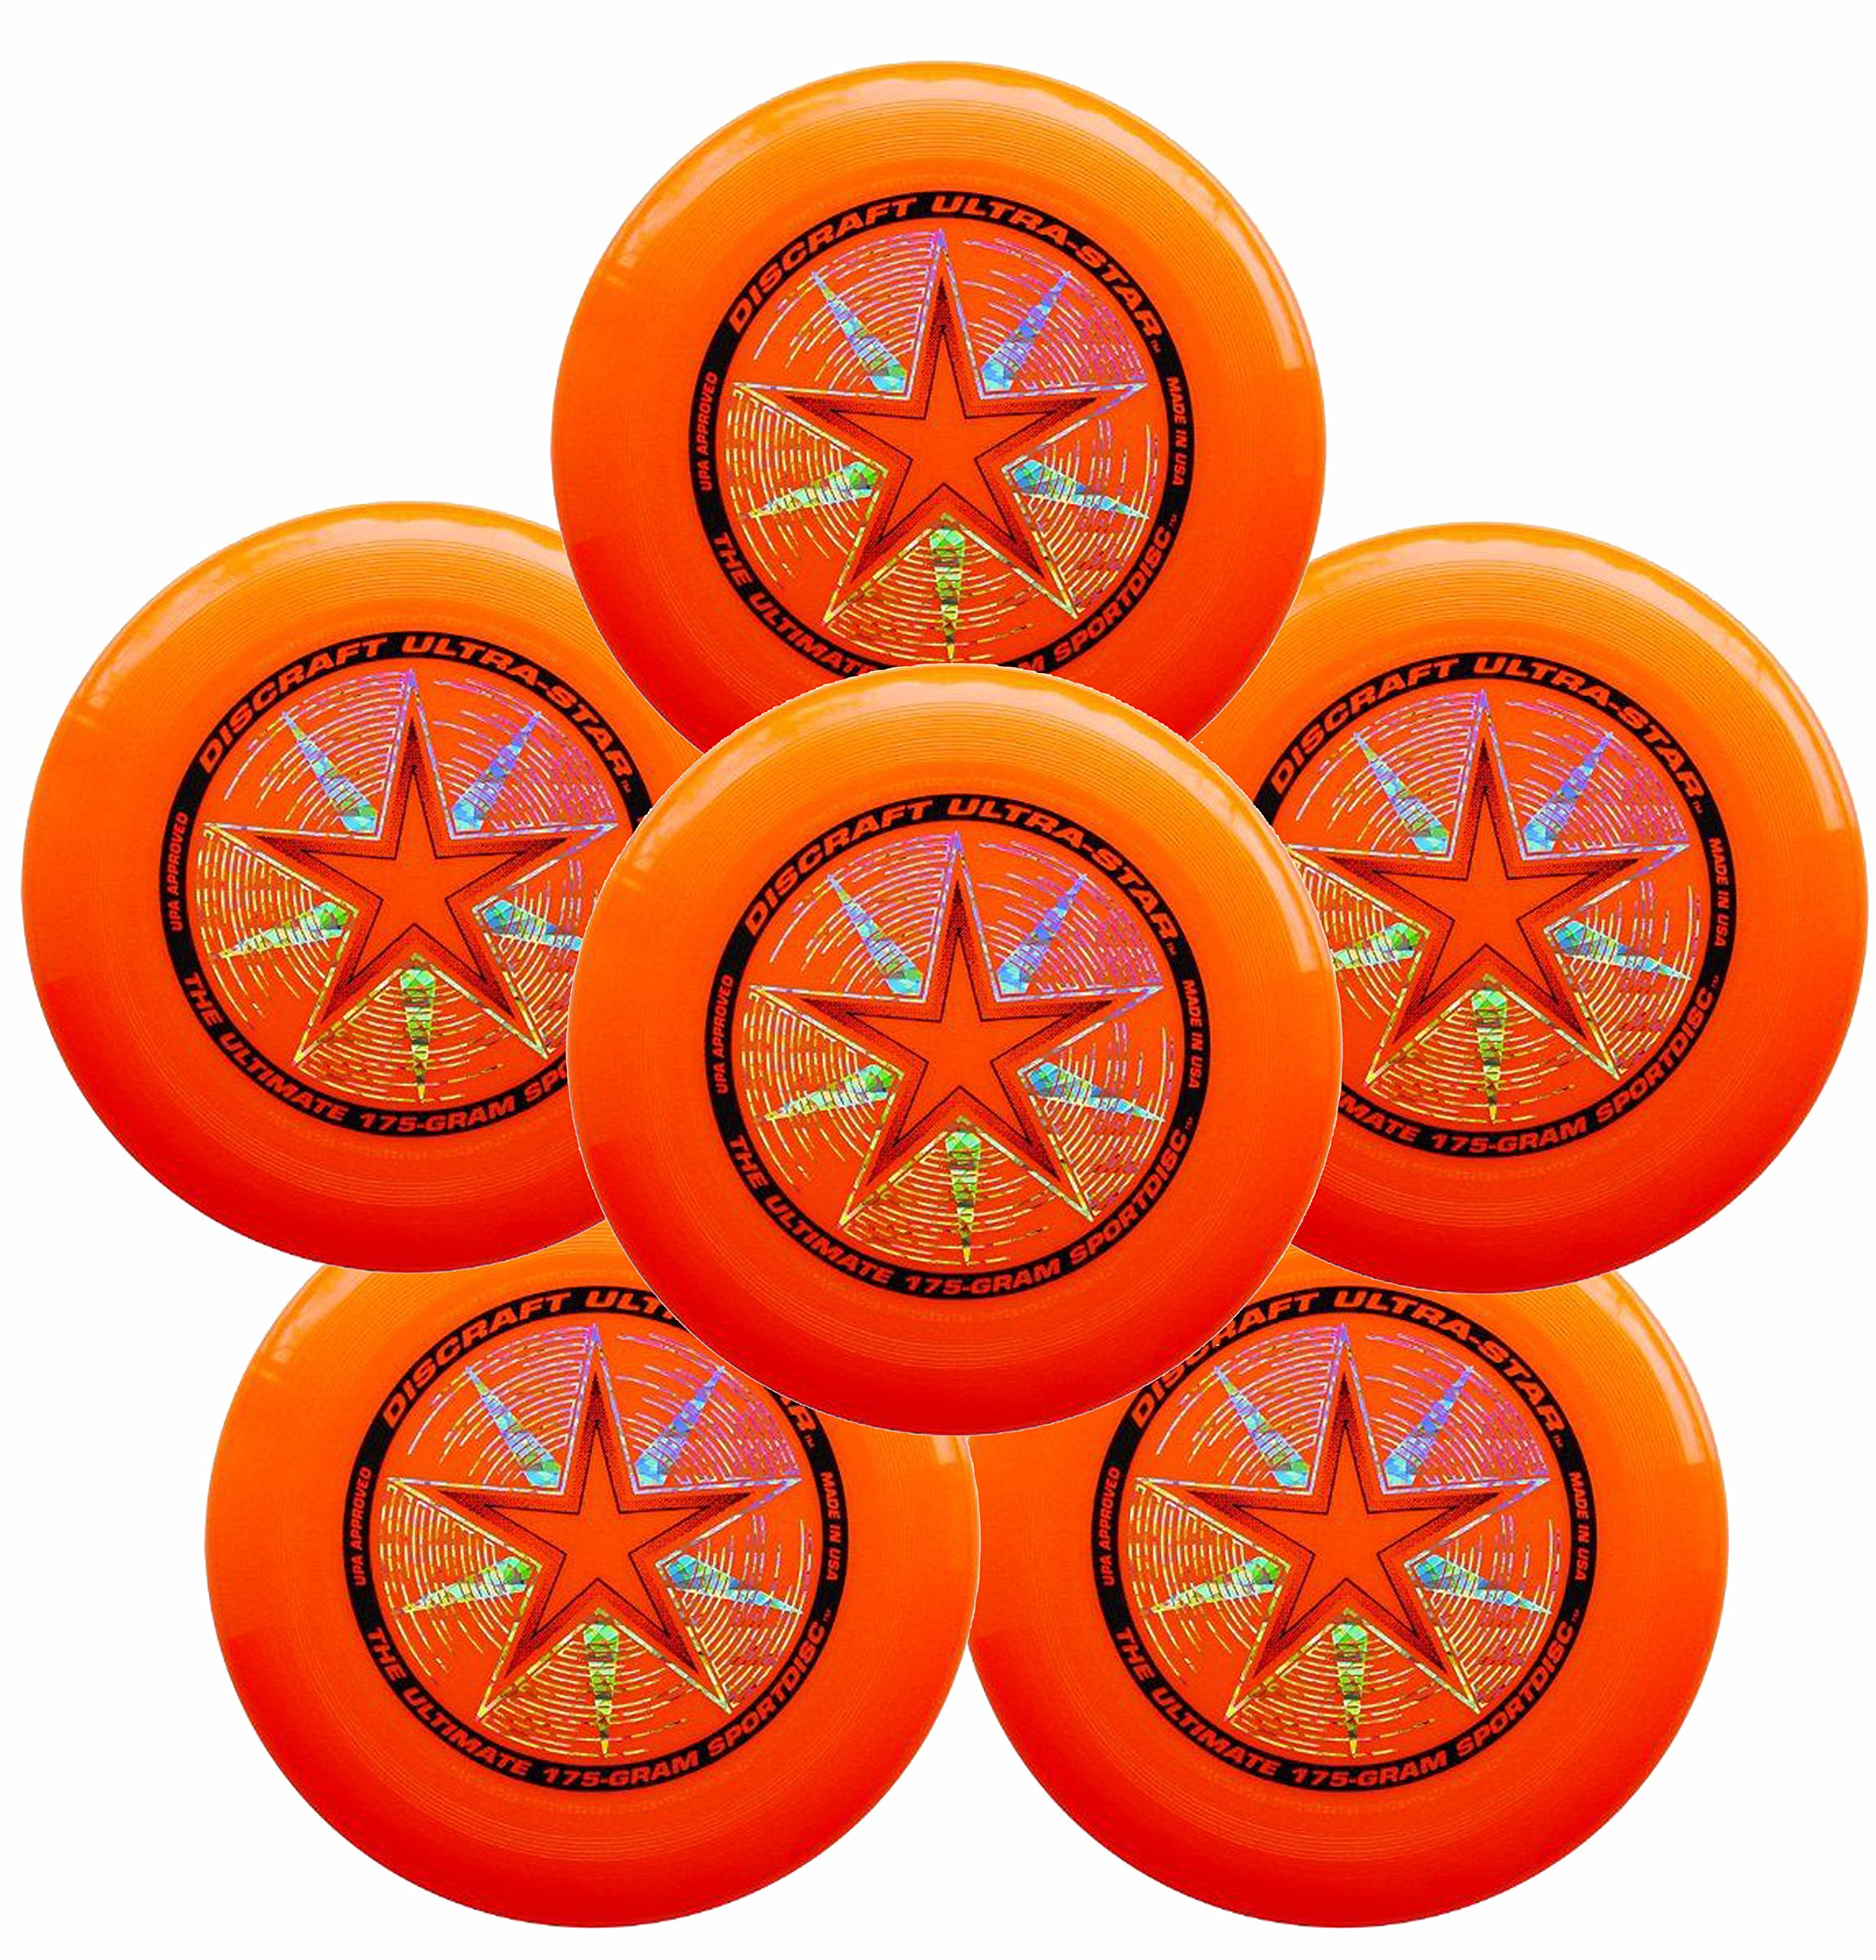 Discraft Ultra-Star 175g Ultimate Frisbee Sport Disc (6 Pack) Orange